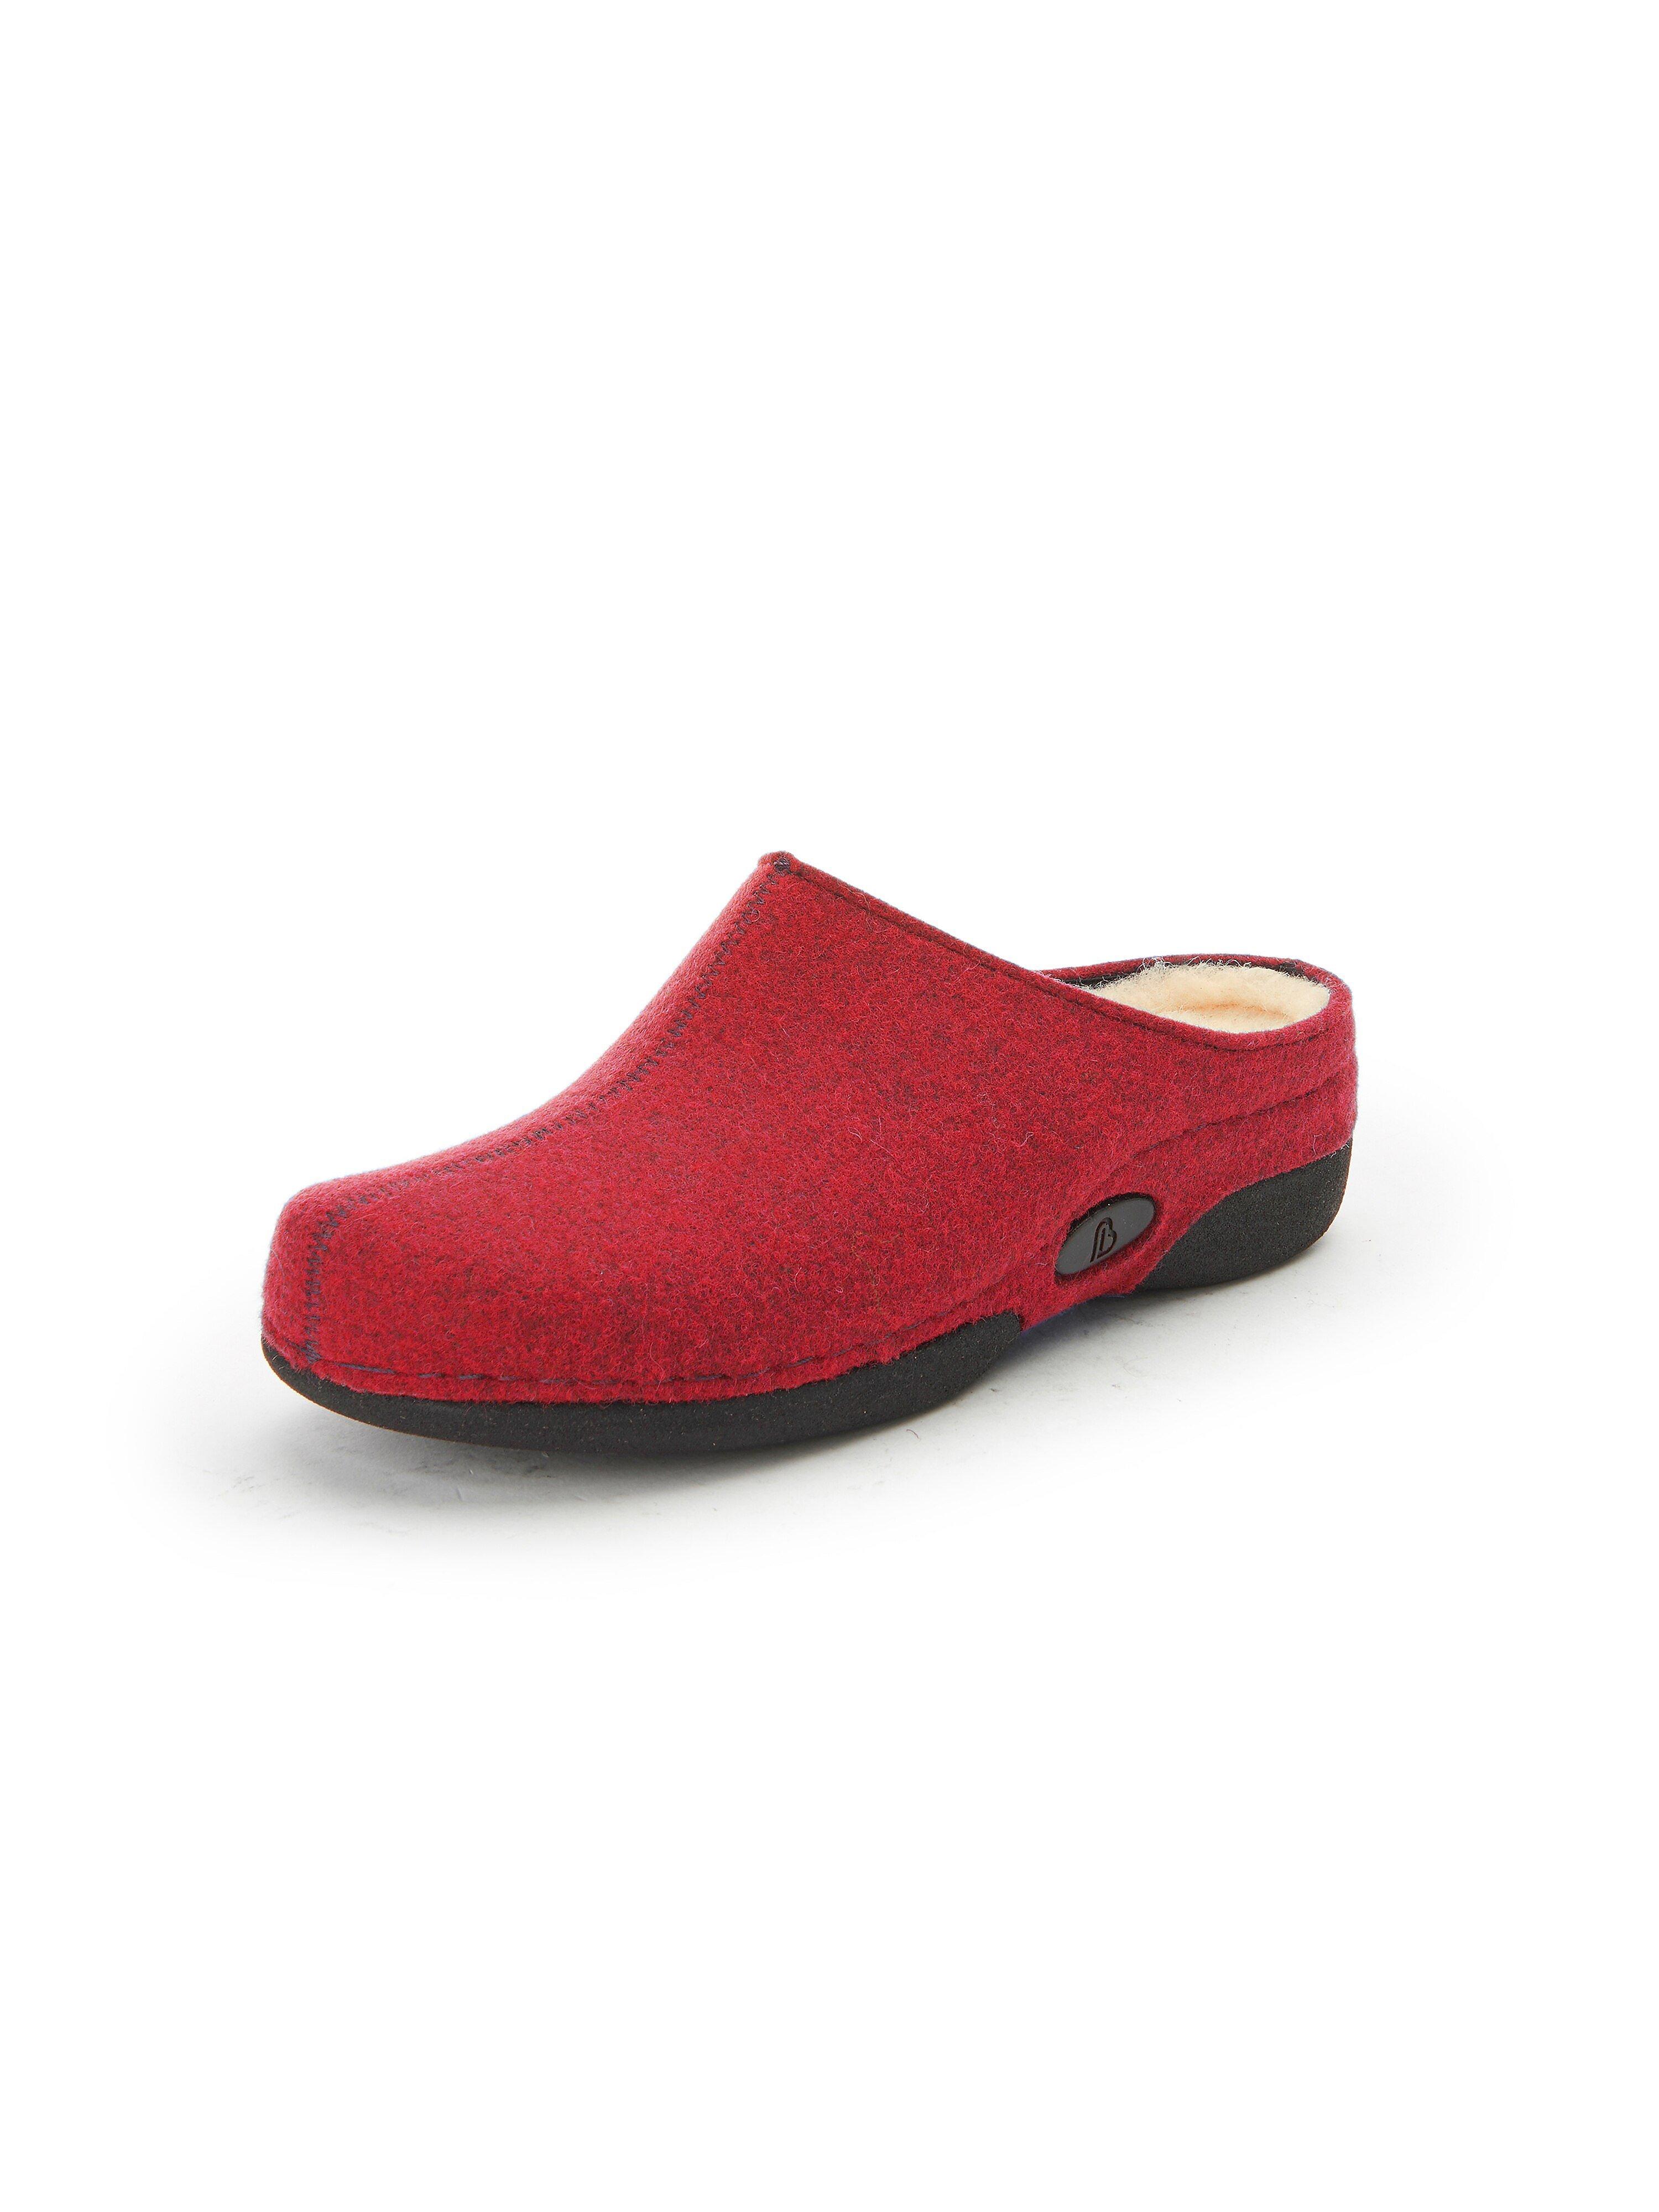 Pantoffels Van Berkemann Original rood